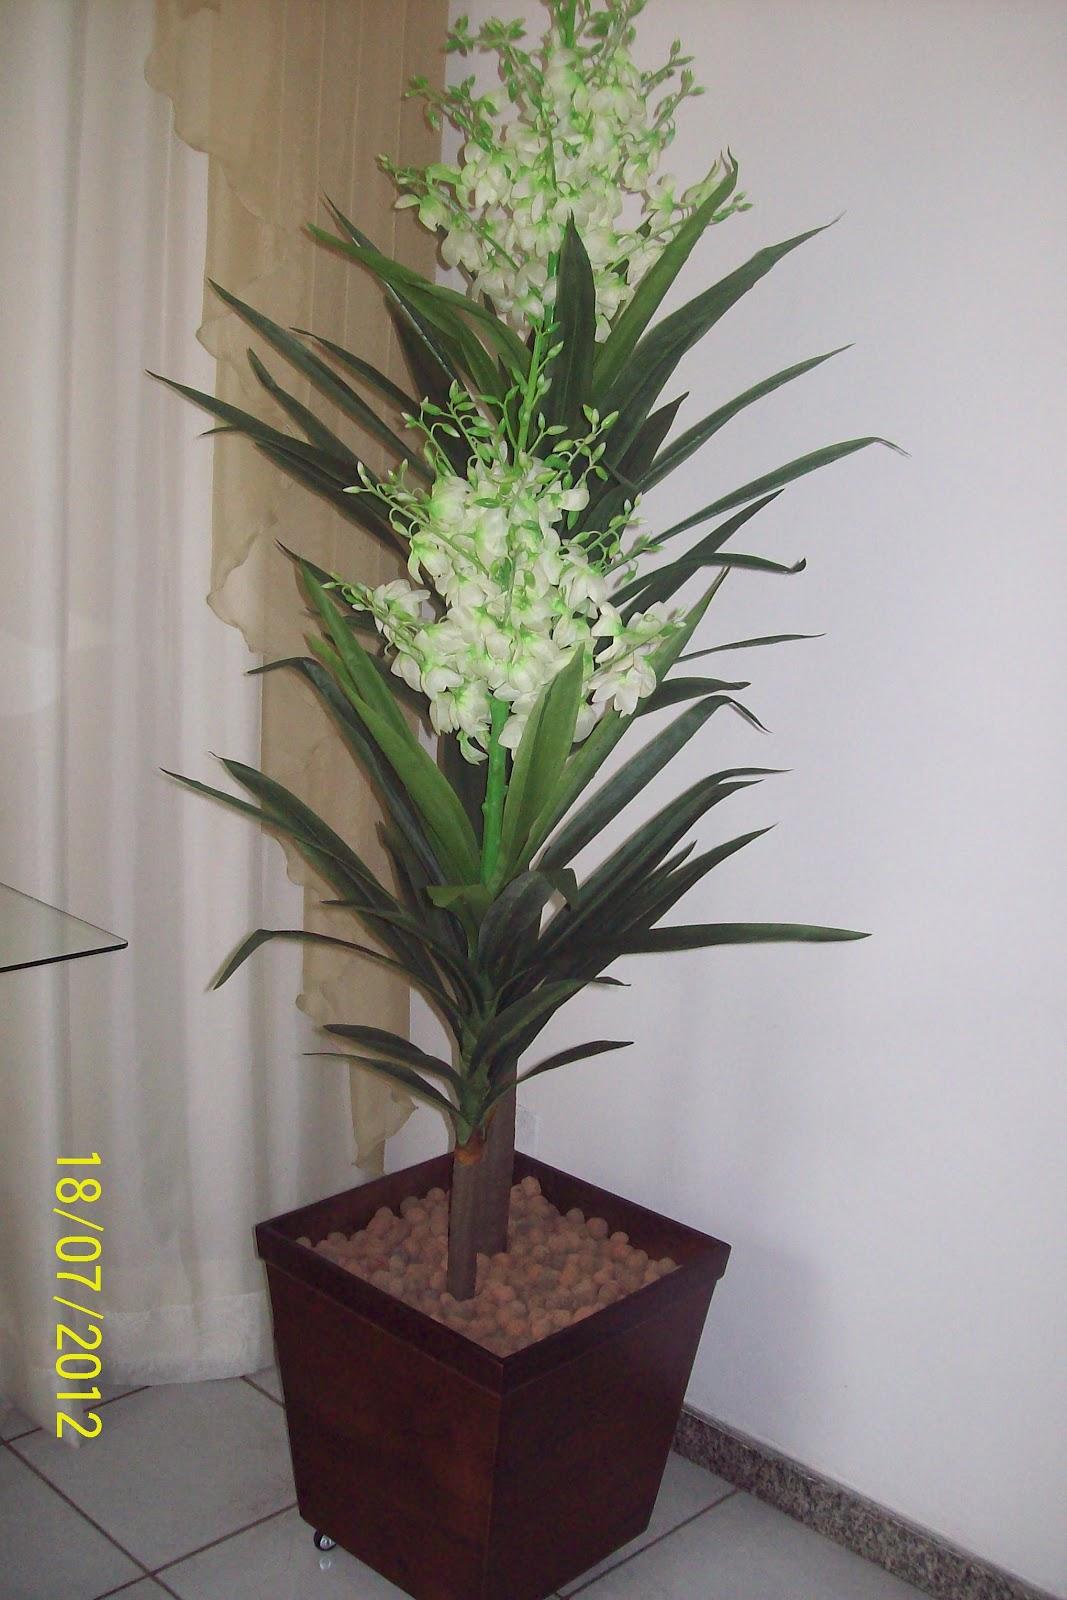 Pruzak Com Vasos De Plantas Para Sala De Tv Id Ias Interessantes  -> Vasos Na Sala De Tv